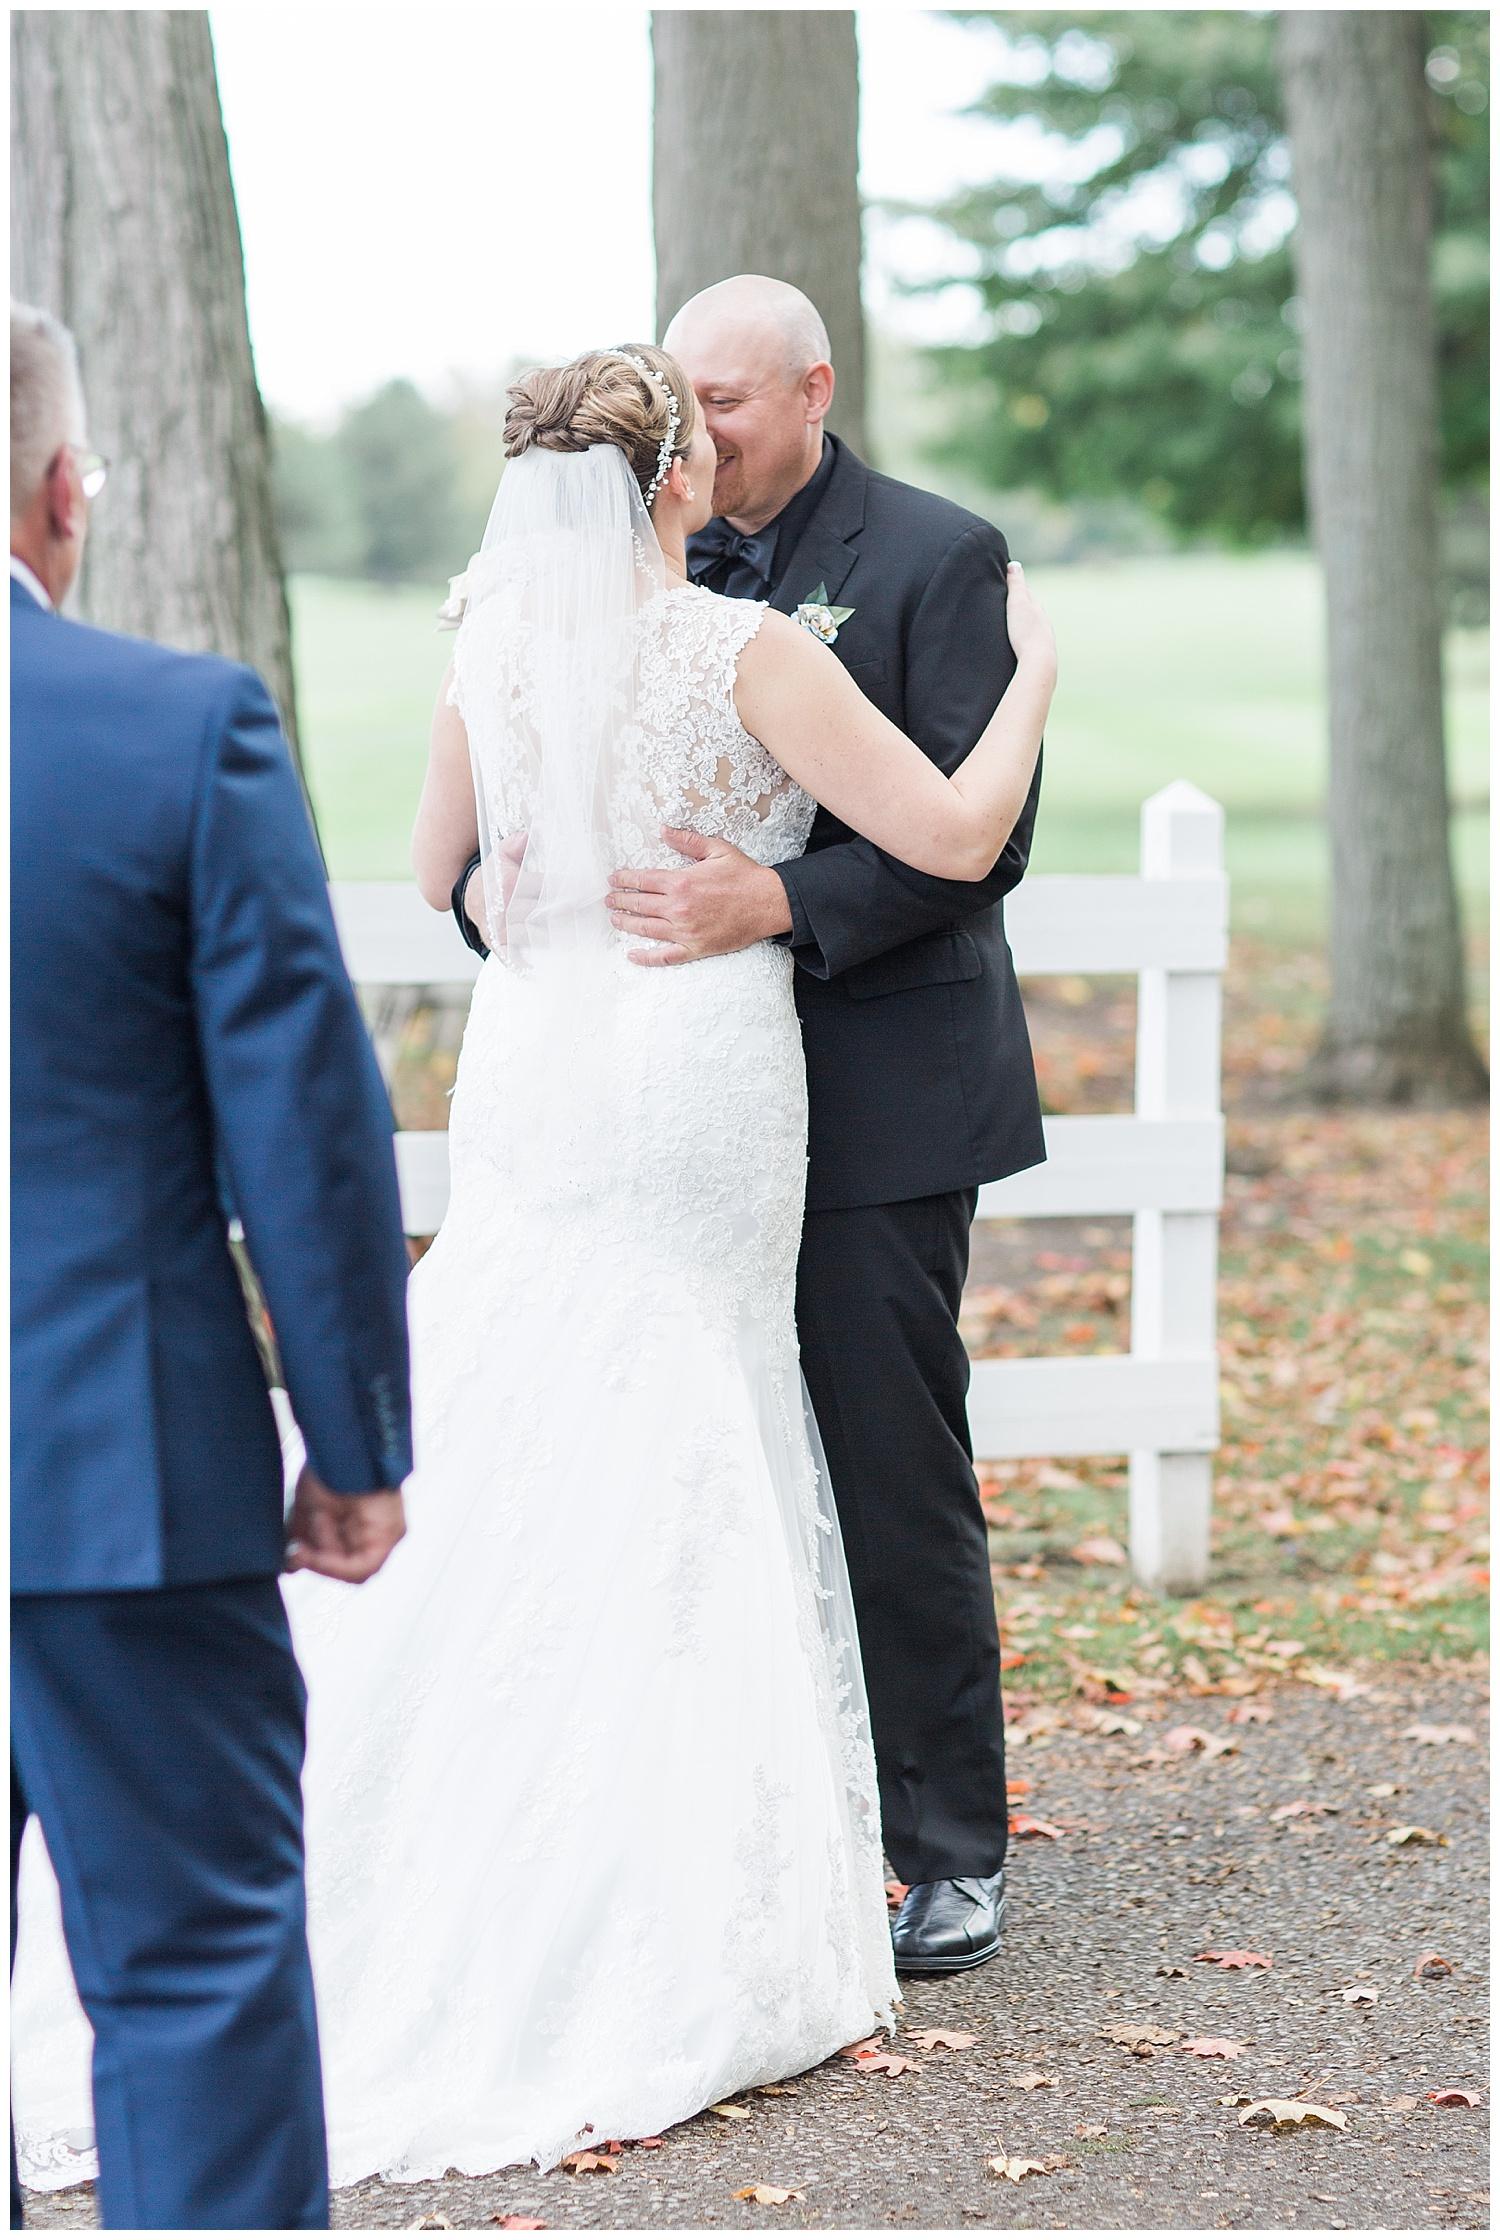 Jessica and Scott McKay - Terry Hills Golf Course - Batavia NY - Lass and Beau-53_Buffalo wedding photography.jpg